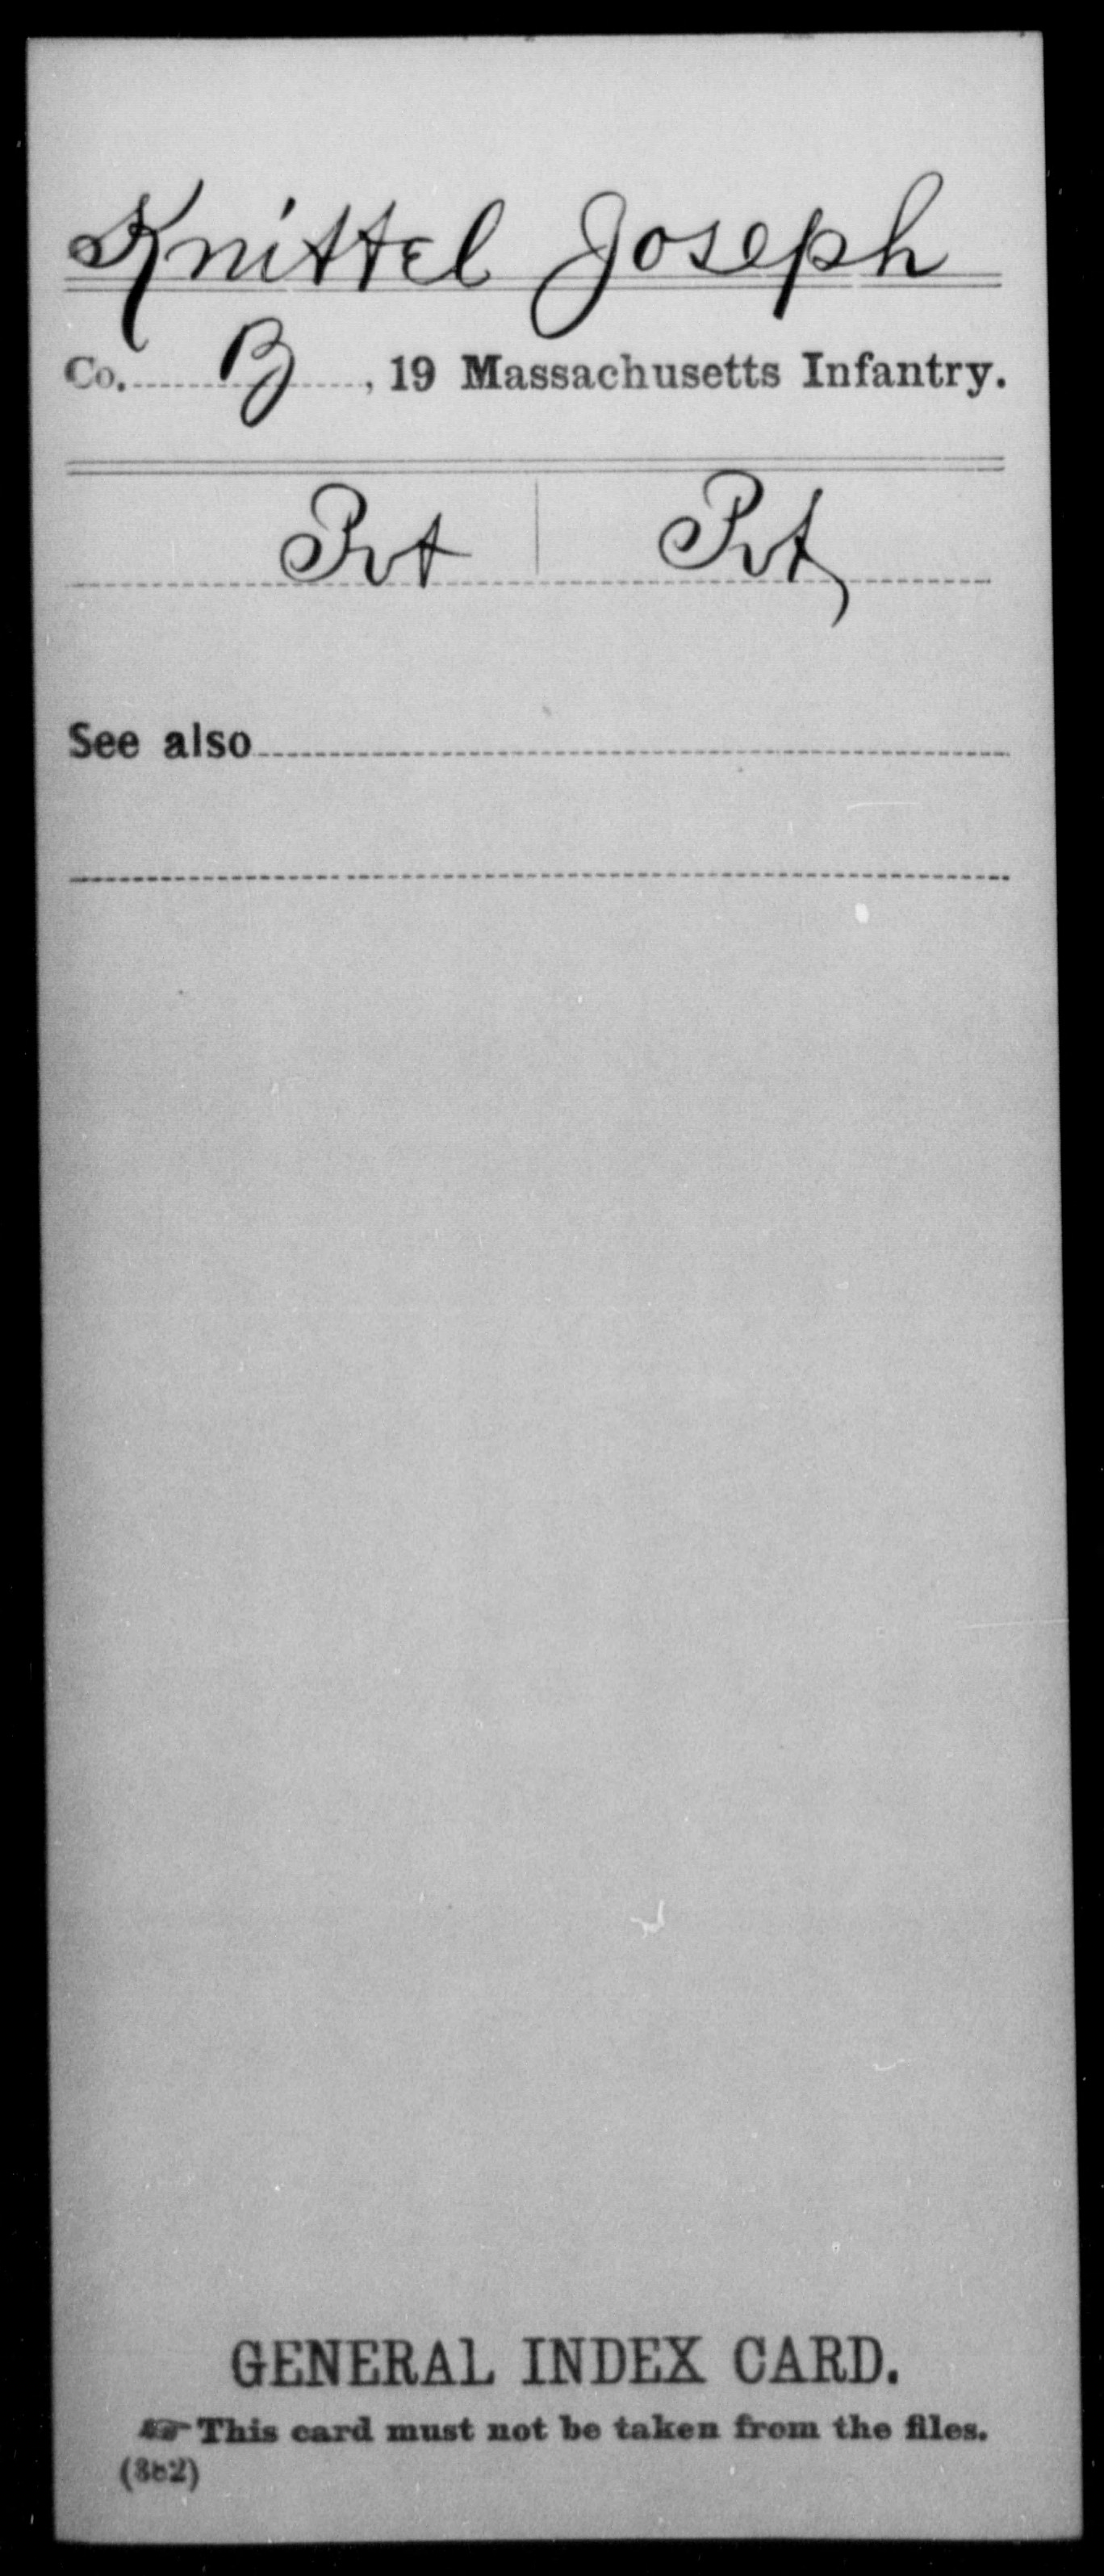 https://s3.amazonaws.com/NARAprodstorage/lz/microfilm-publications/M544-CW_ServRecdIndex_Union_MA/0001/M544_0023/images/0323.jpg